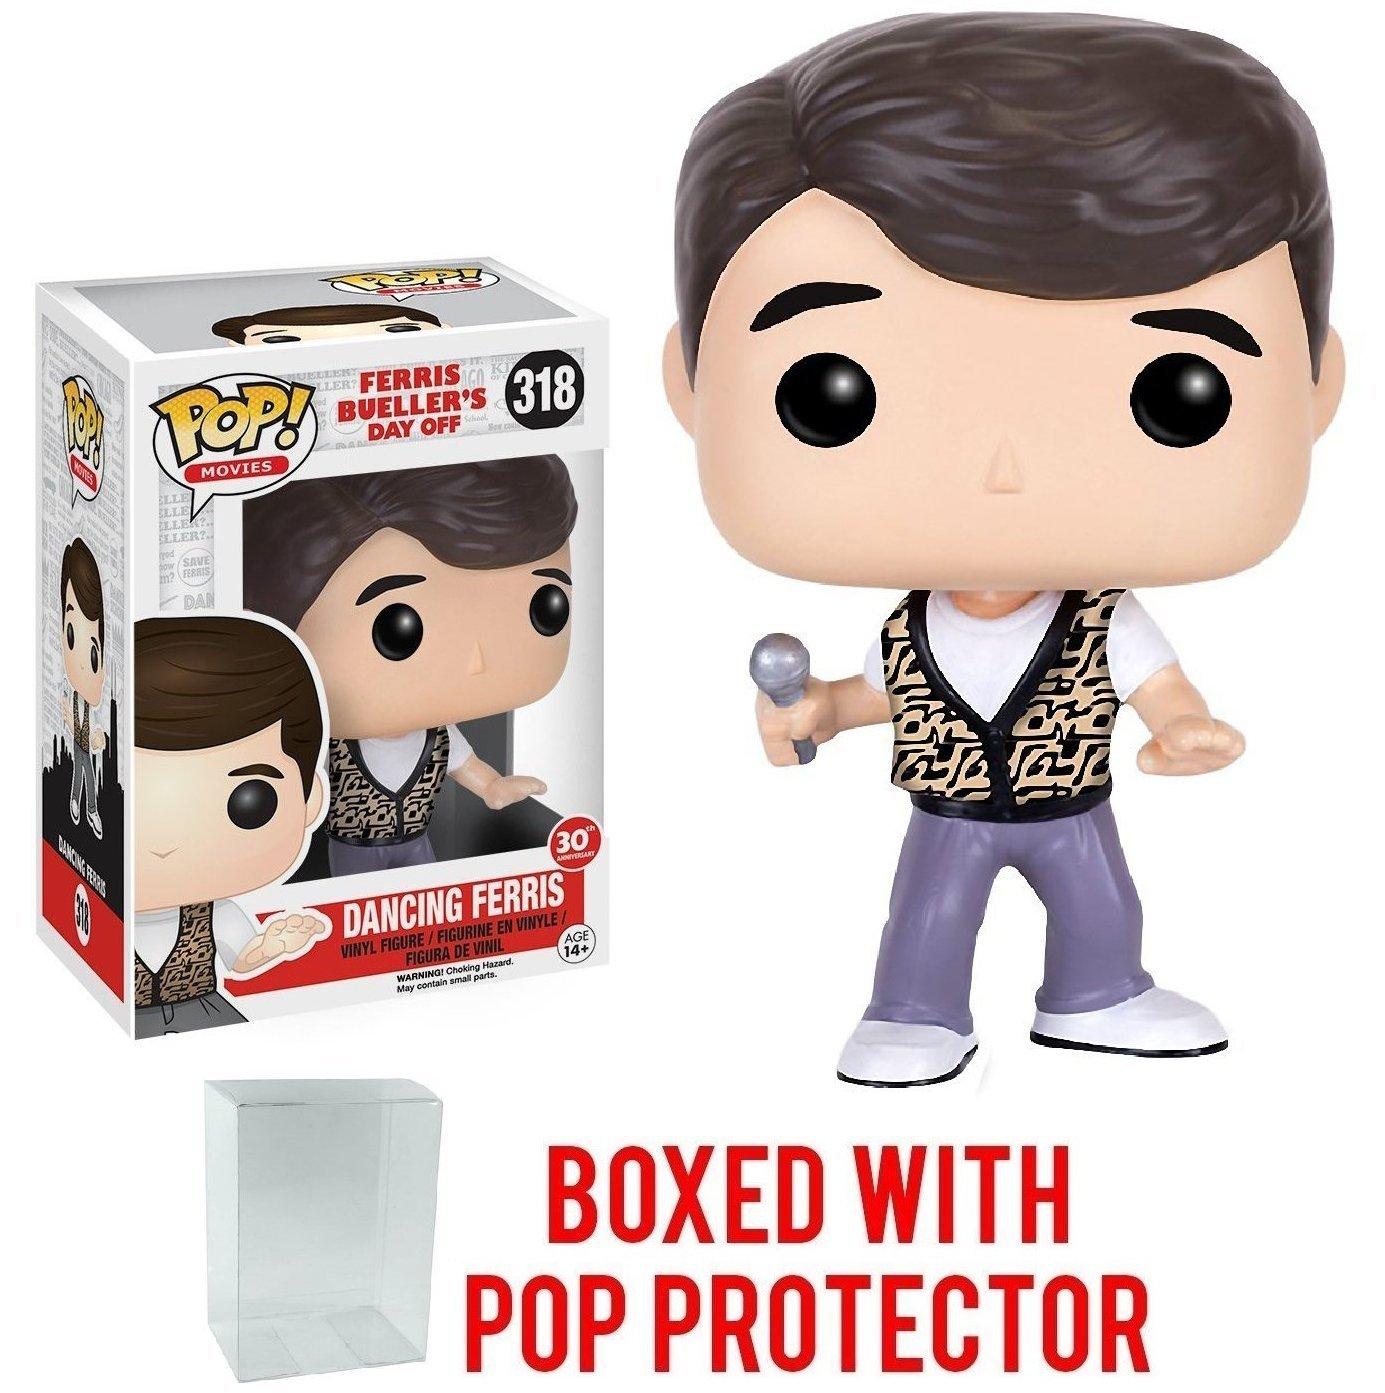 Bundled with Pop Box Protector Case Movies: Ferris Buellers Day Off Dancing Ferris Vinyl Figure Funko Pop